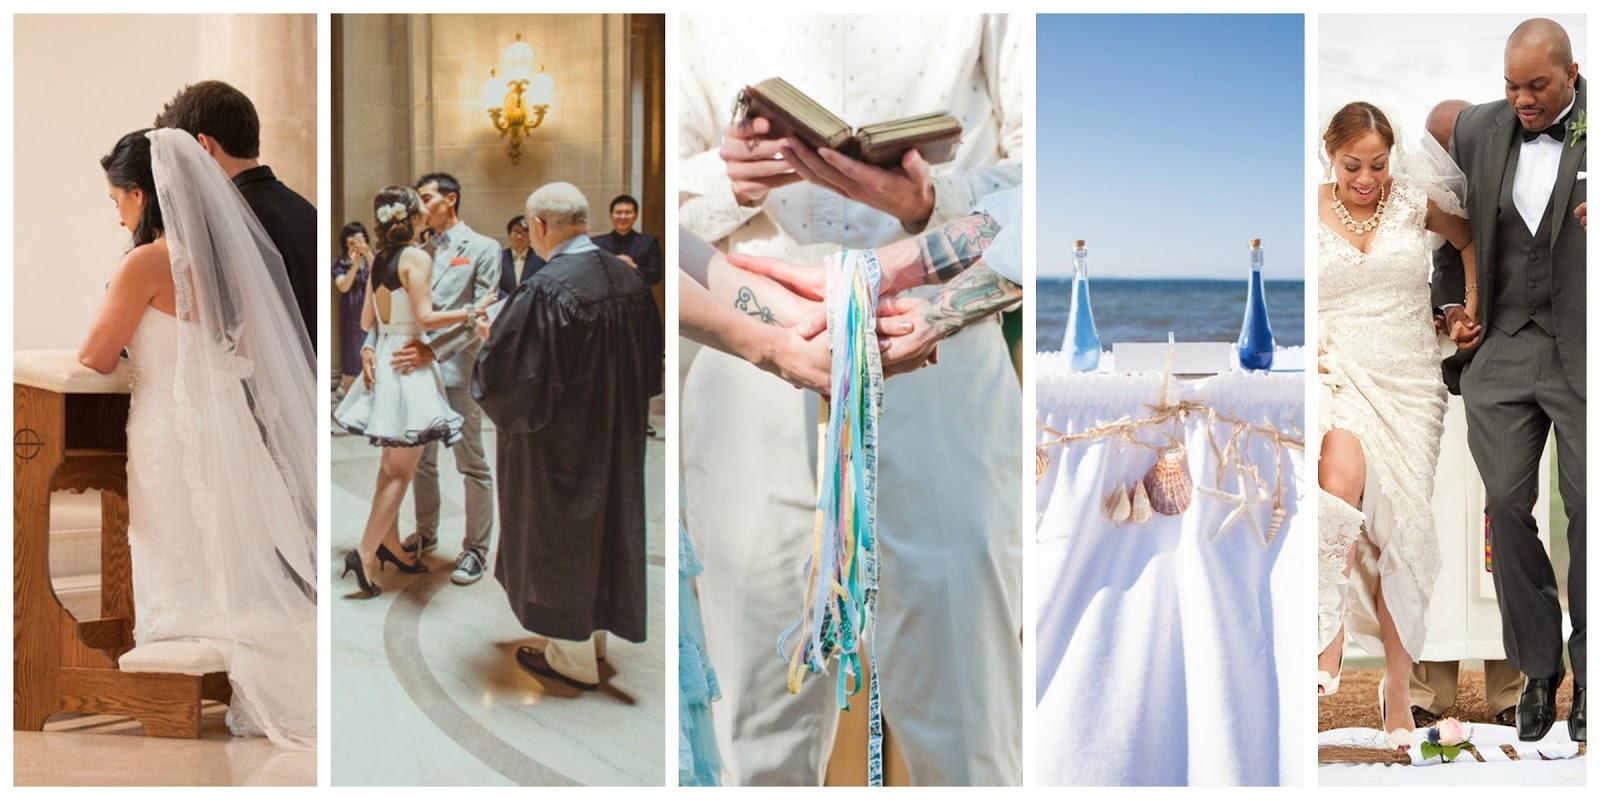 Wedding Advice Ceremony Ideas Unity Sand Church Tying The